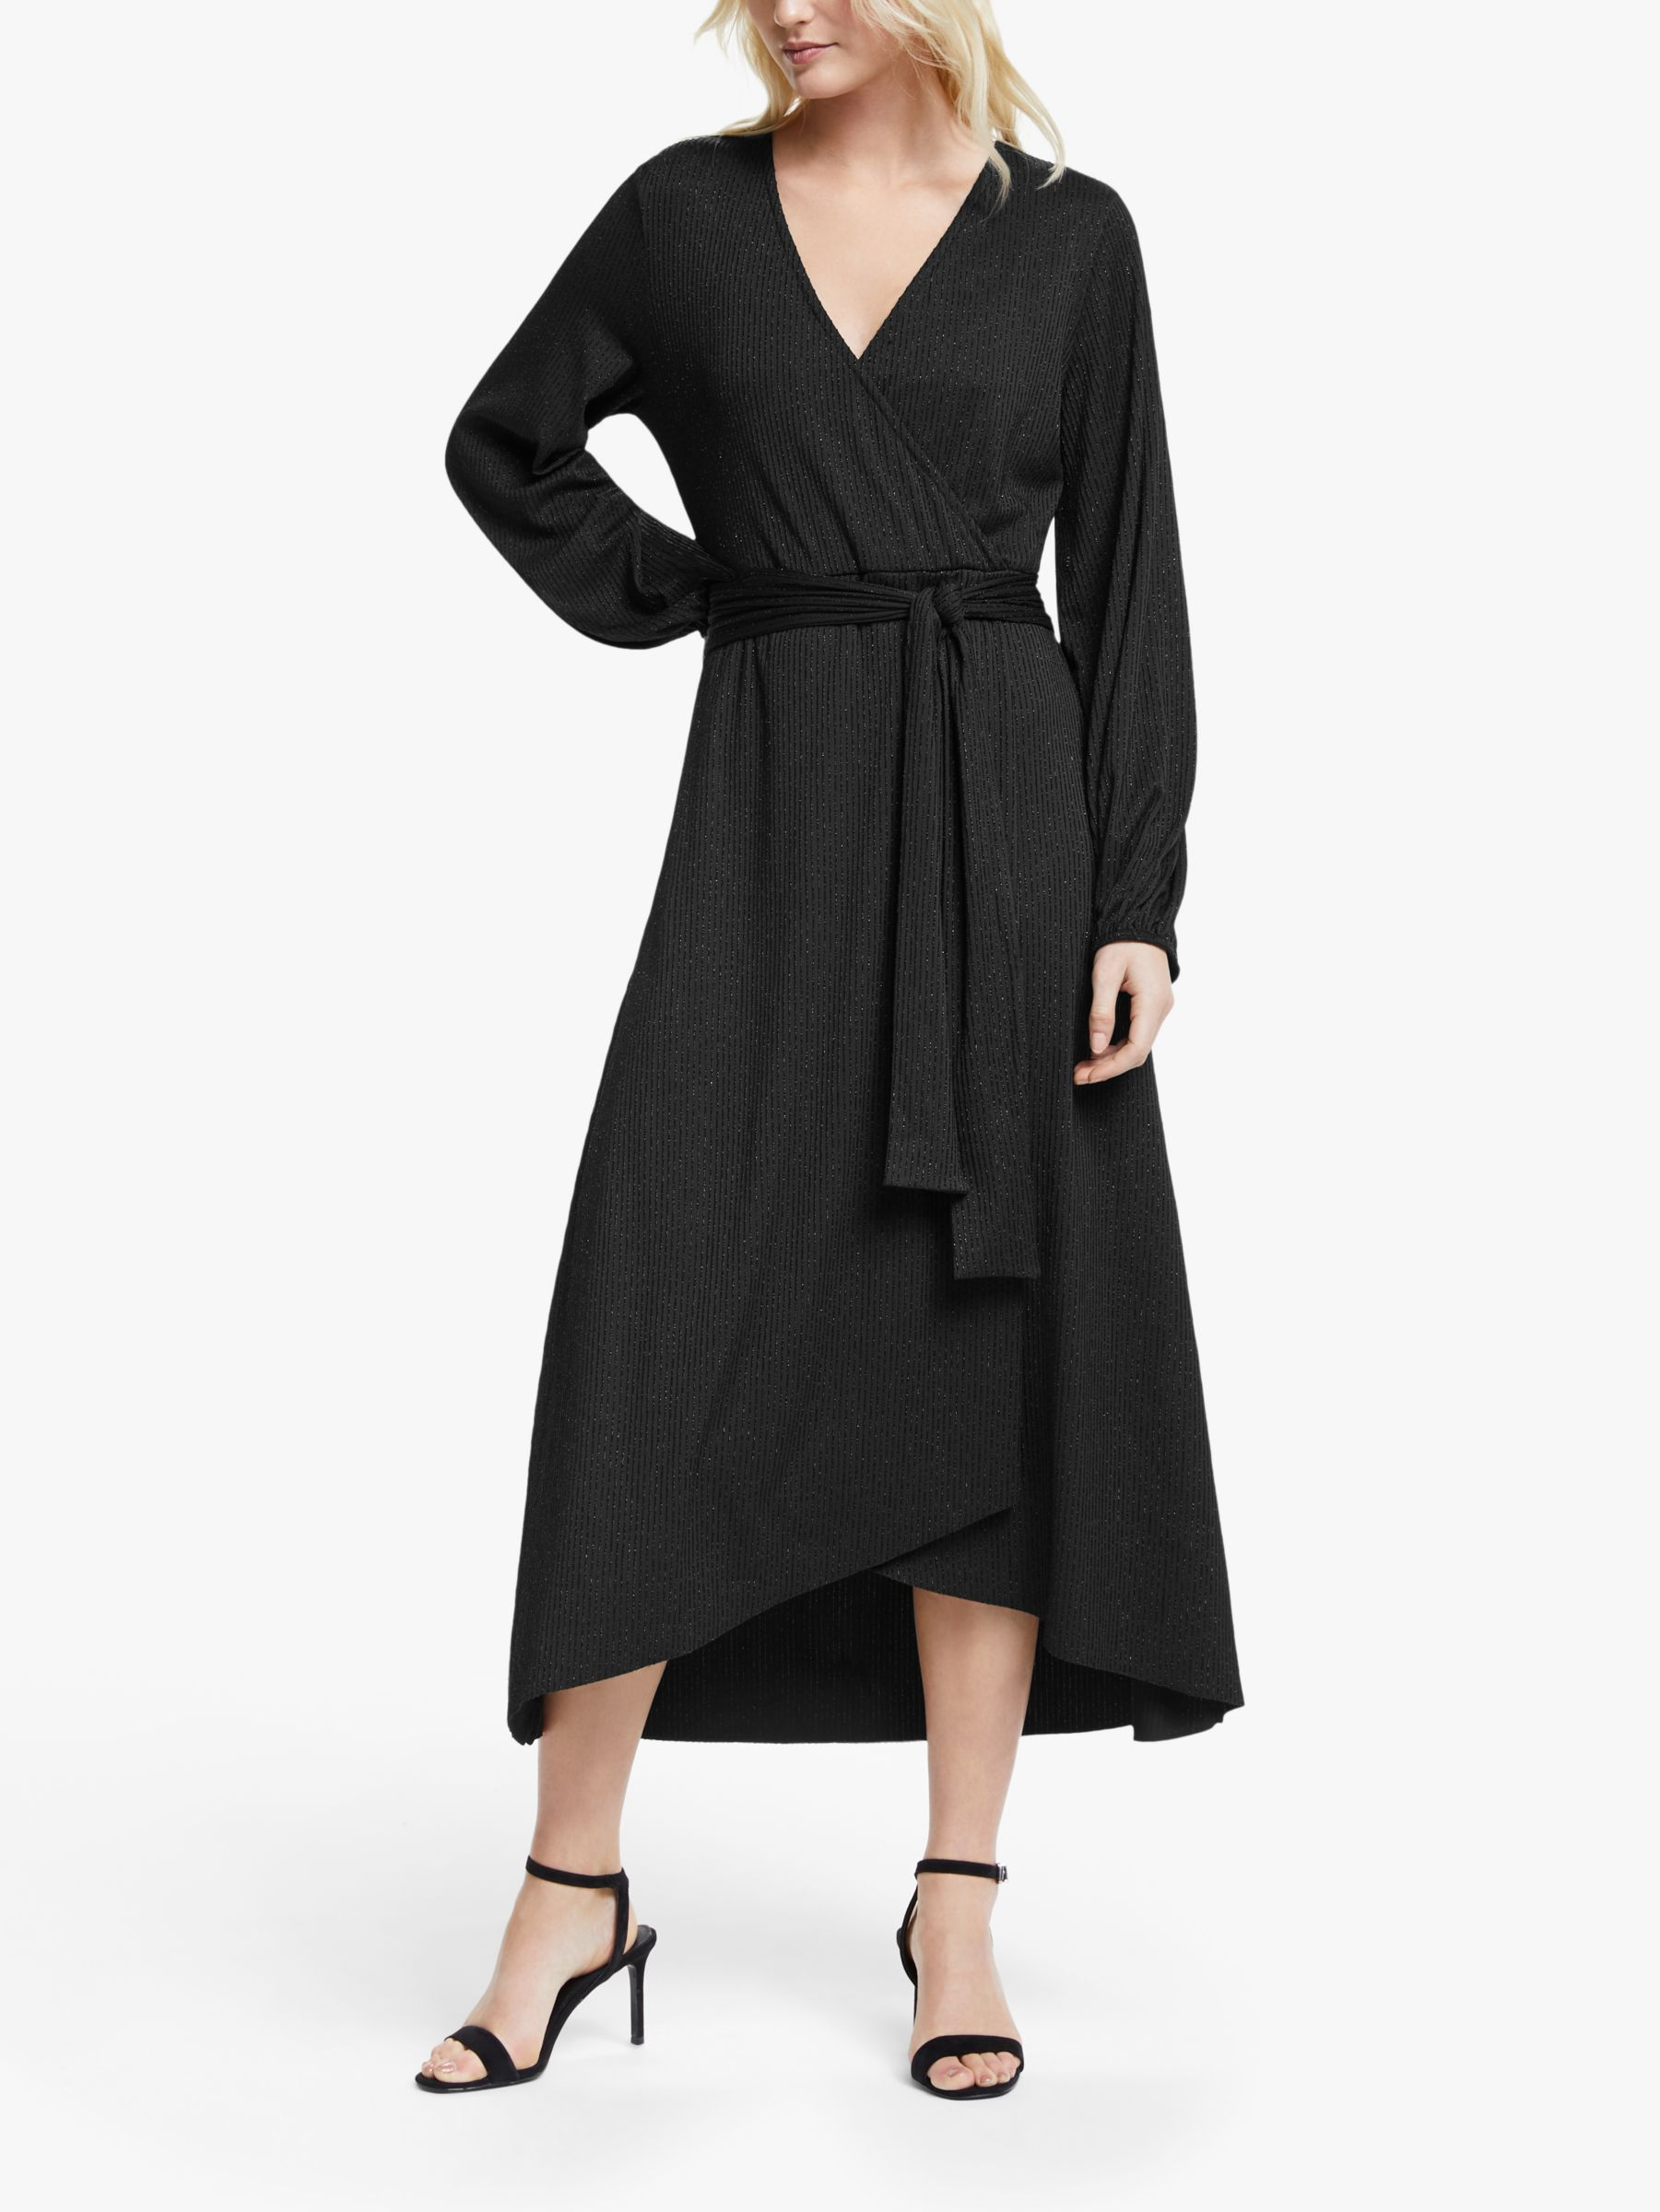 Gestuz Gestuz Justa Wrap Dress, Black